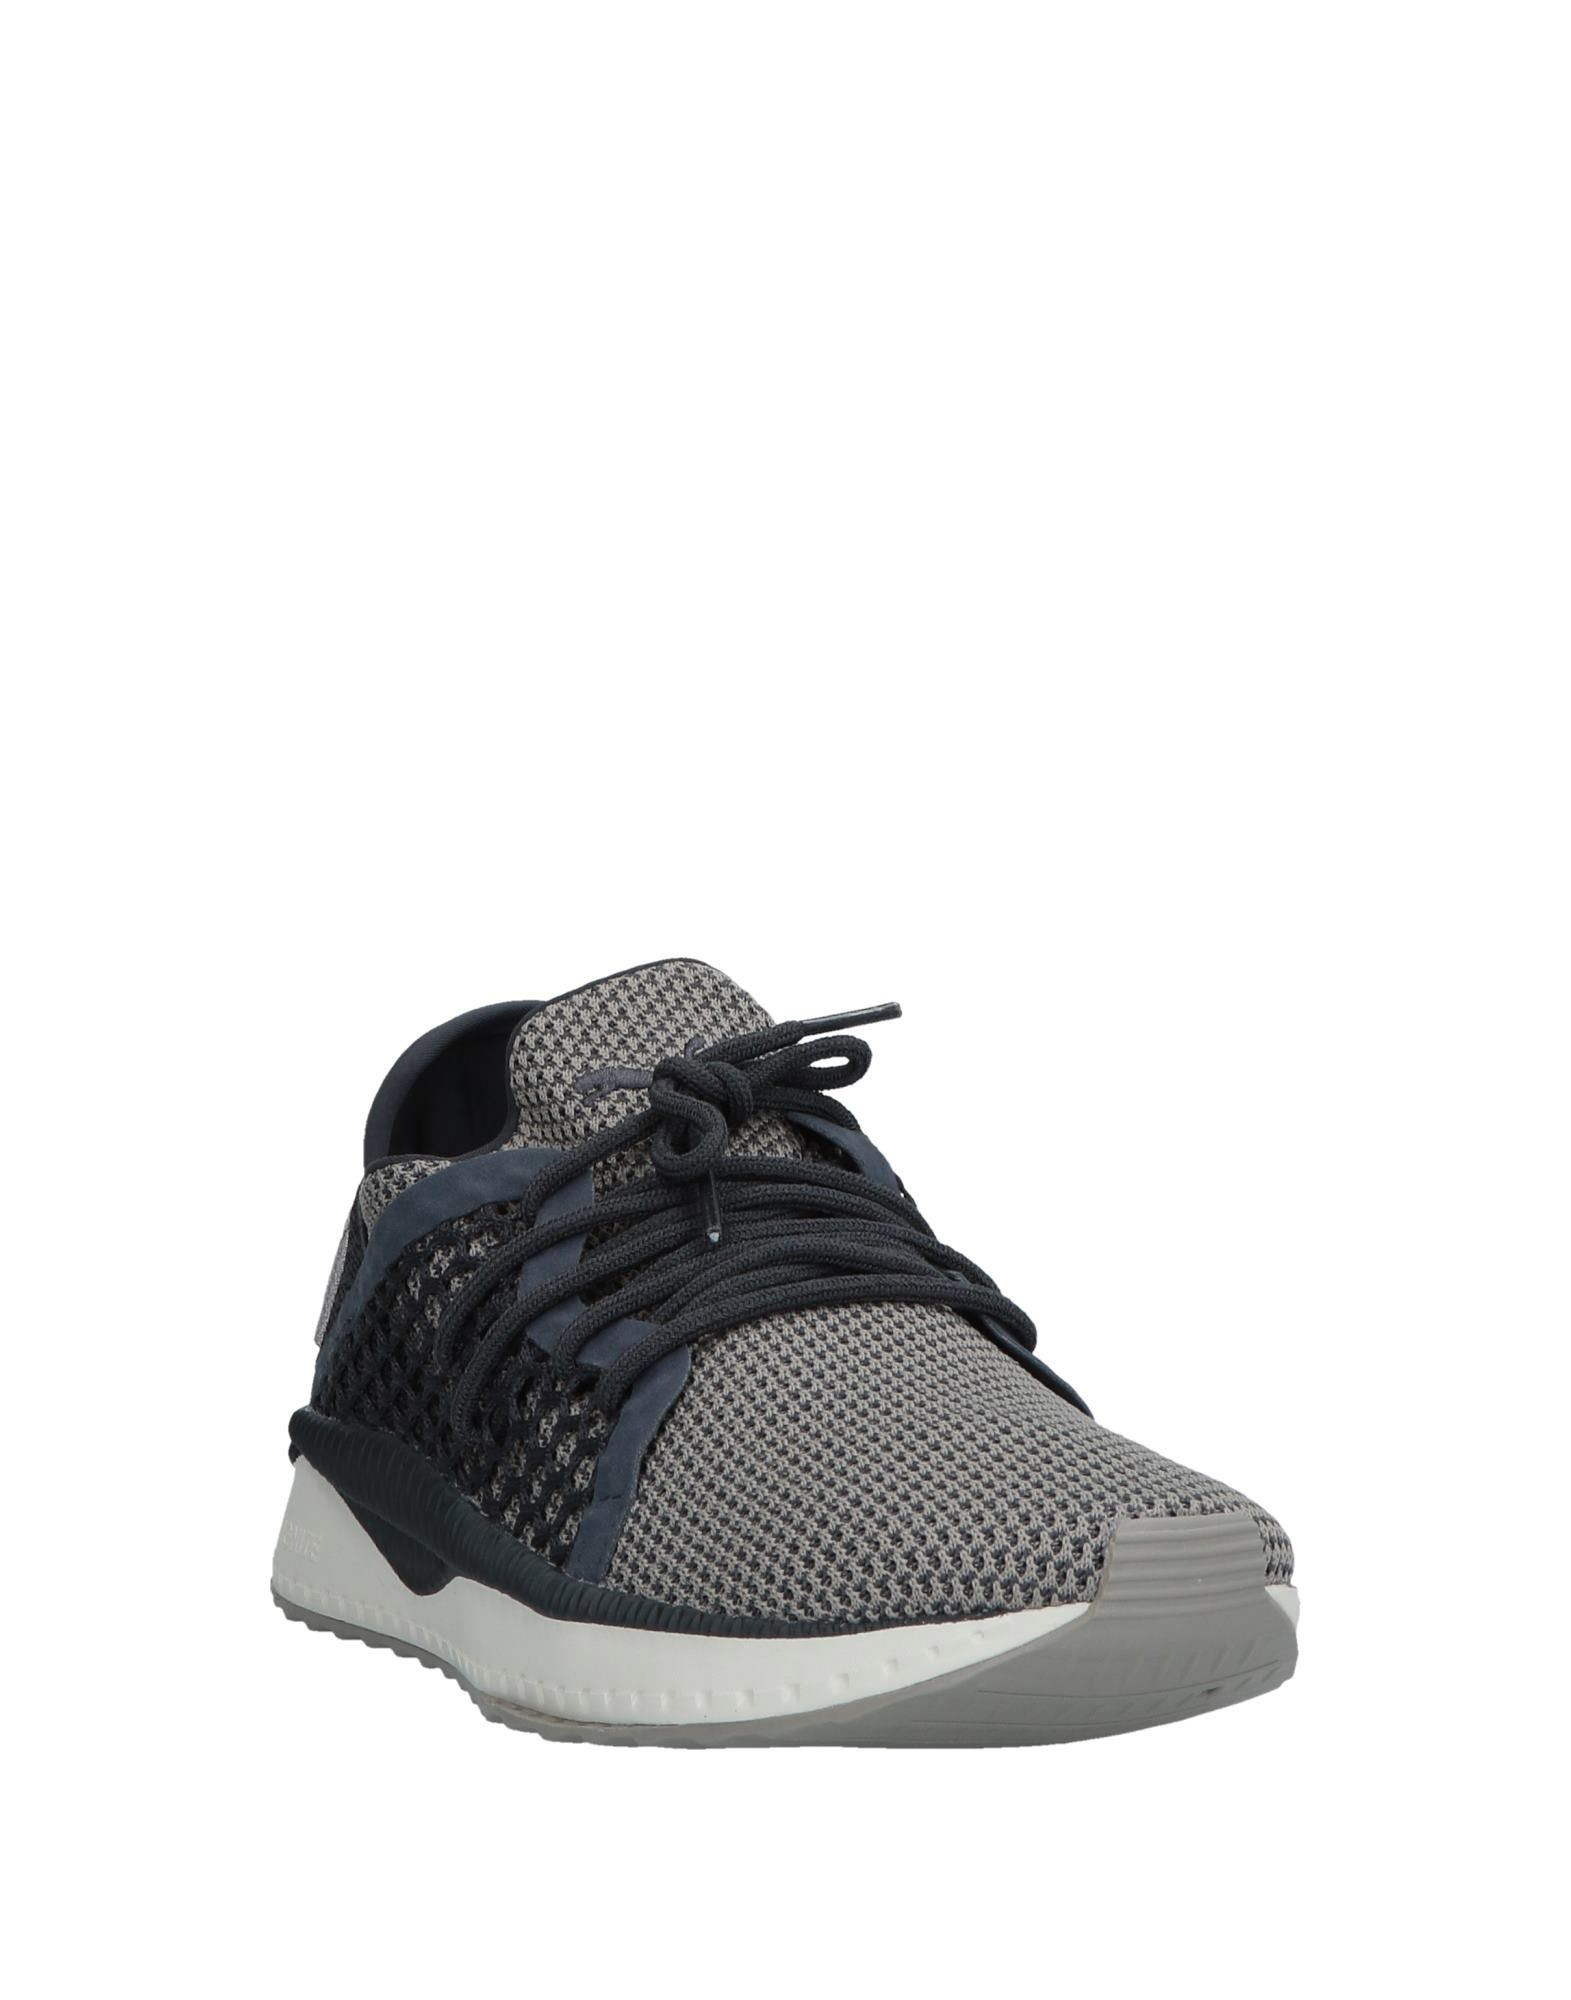 Rabatt echte  Schuhe Puma Sneakers Herren  echte 11559285HV 14497a